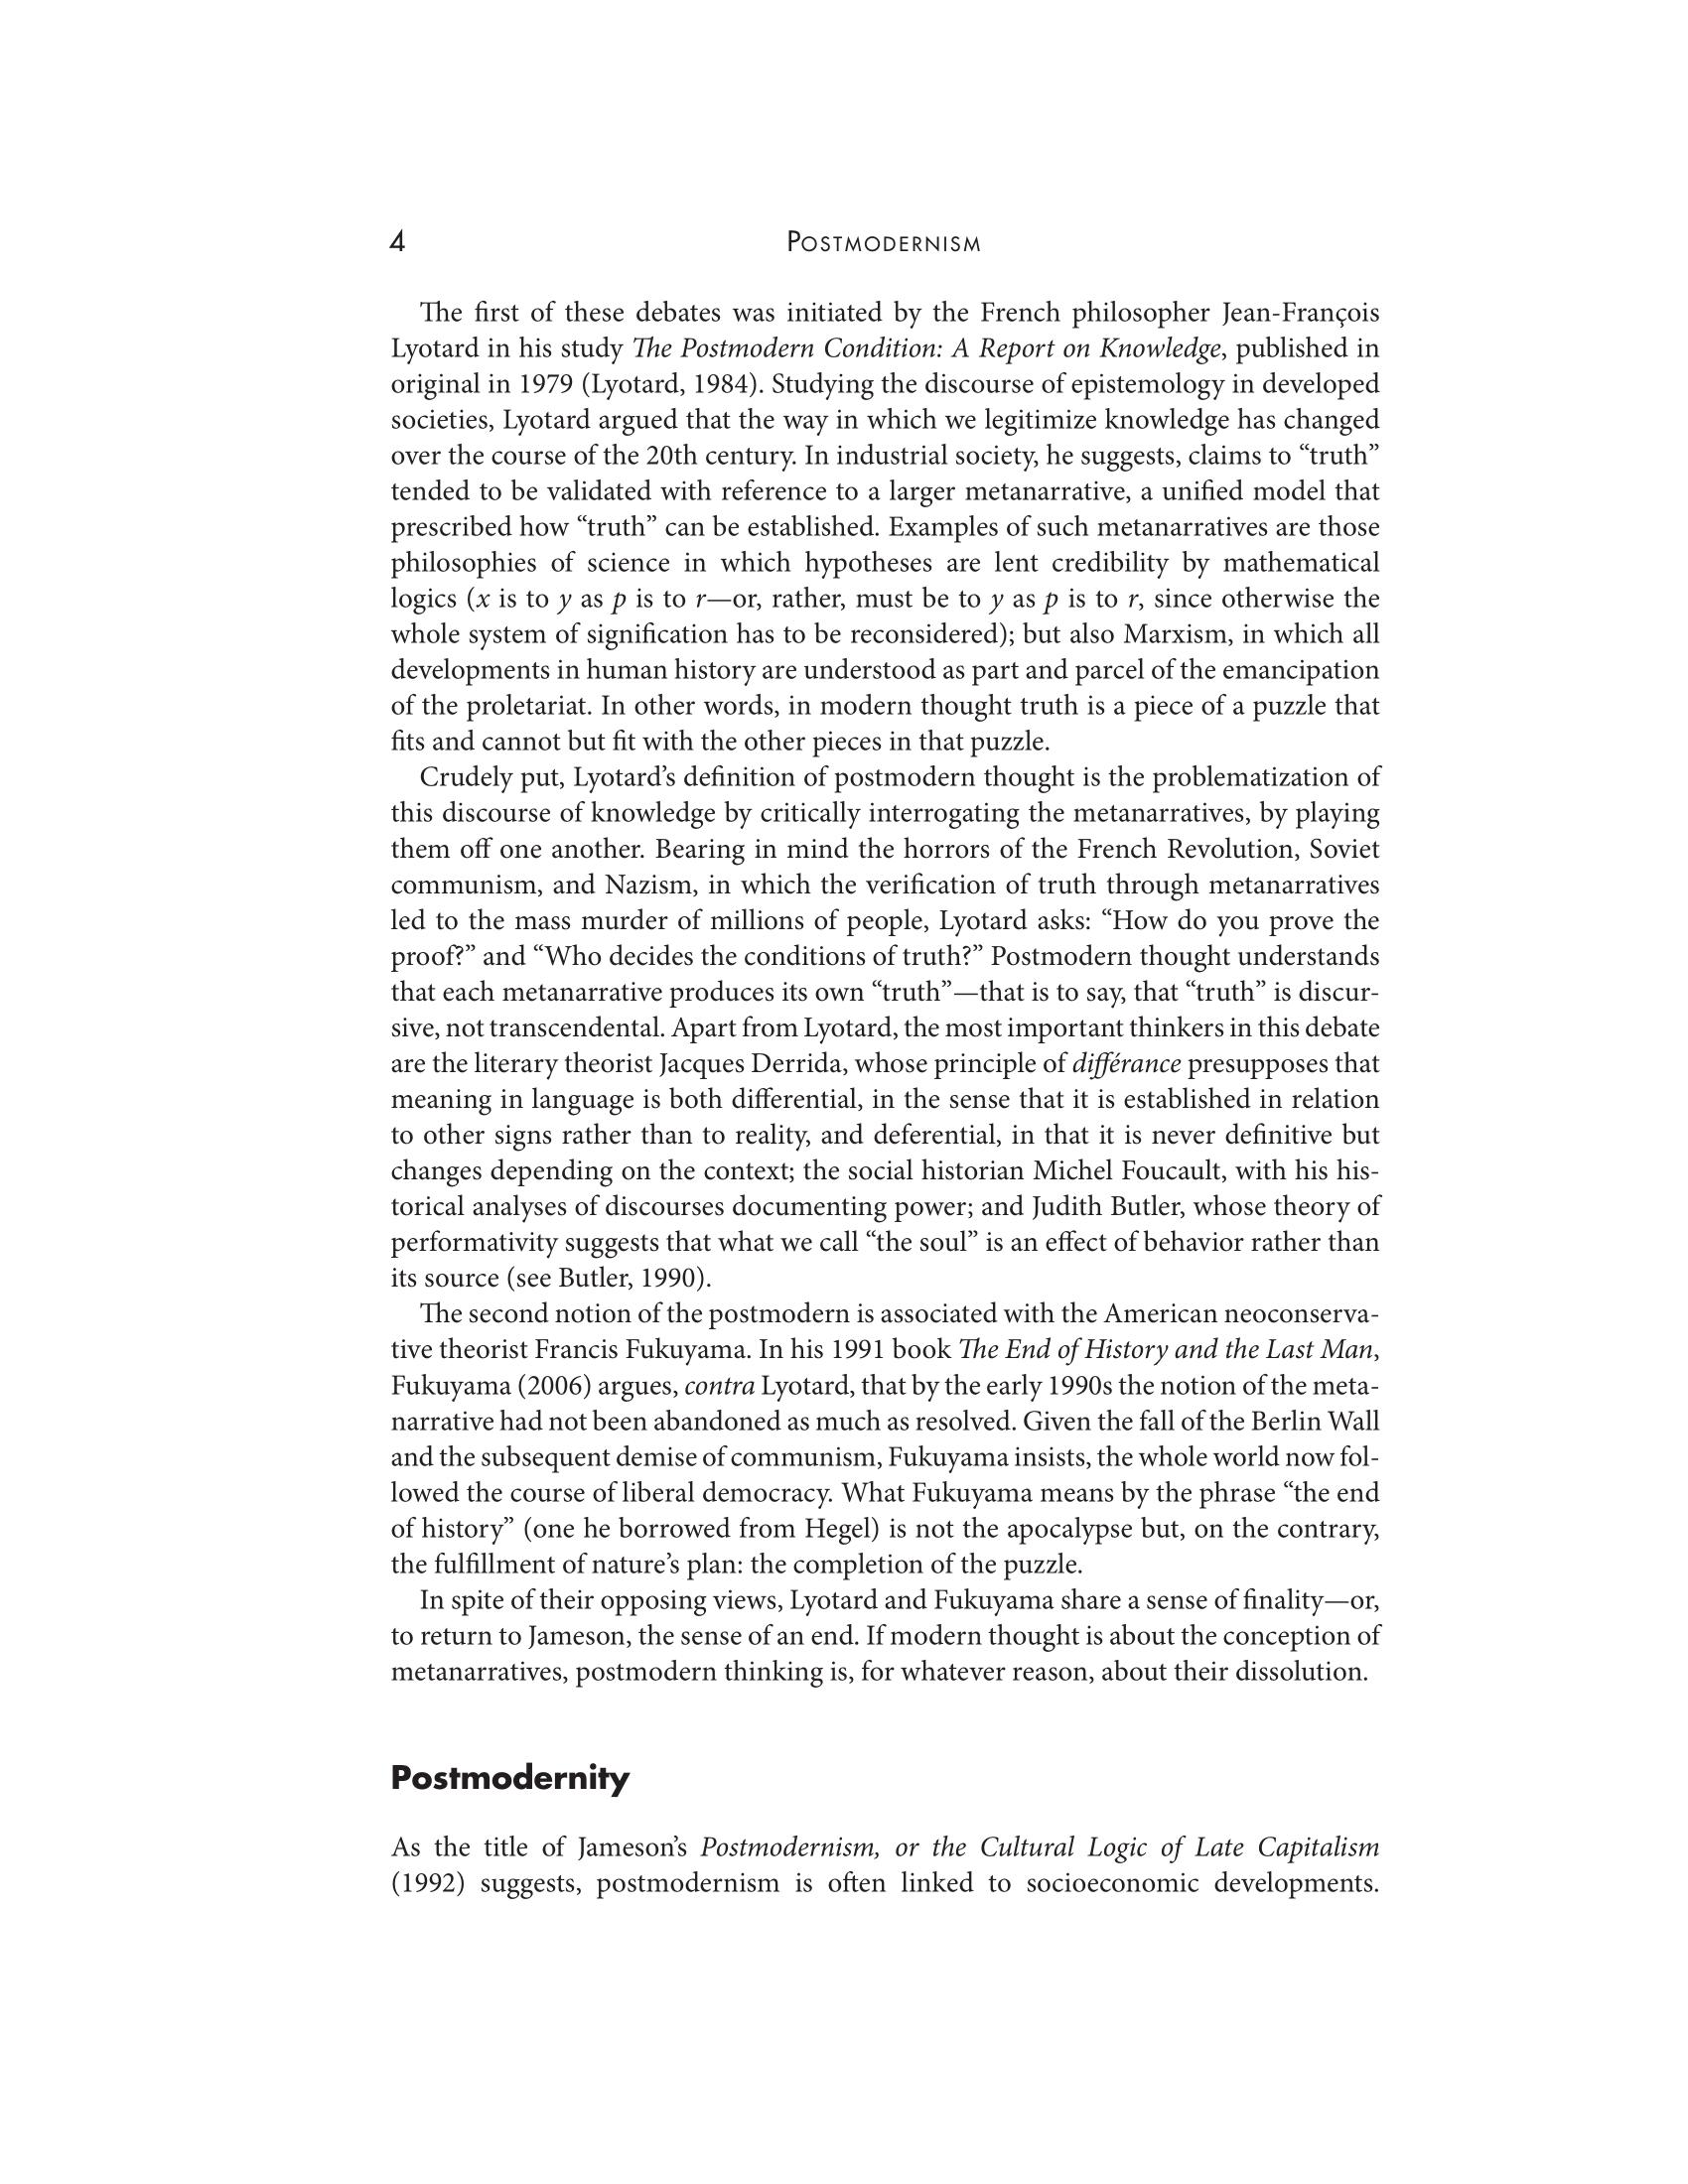 Postmodernism-4.png